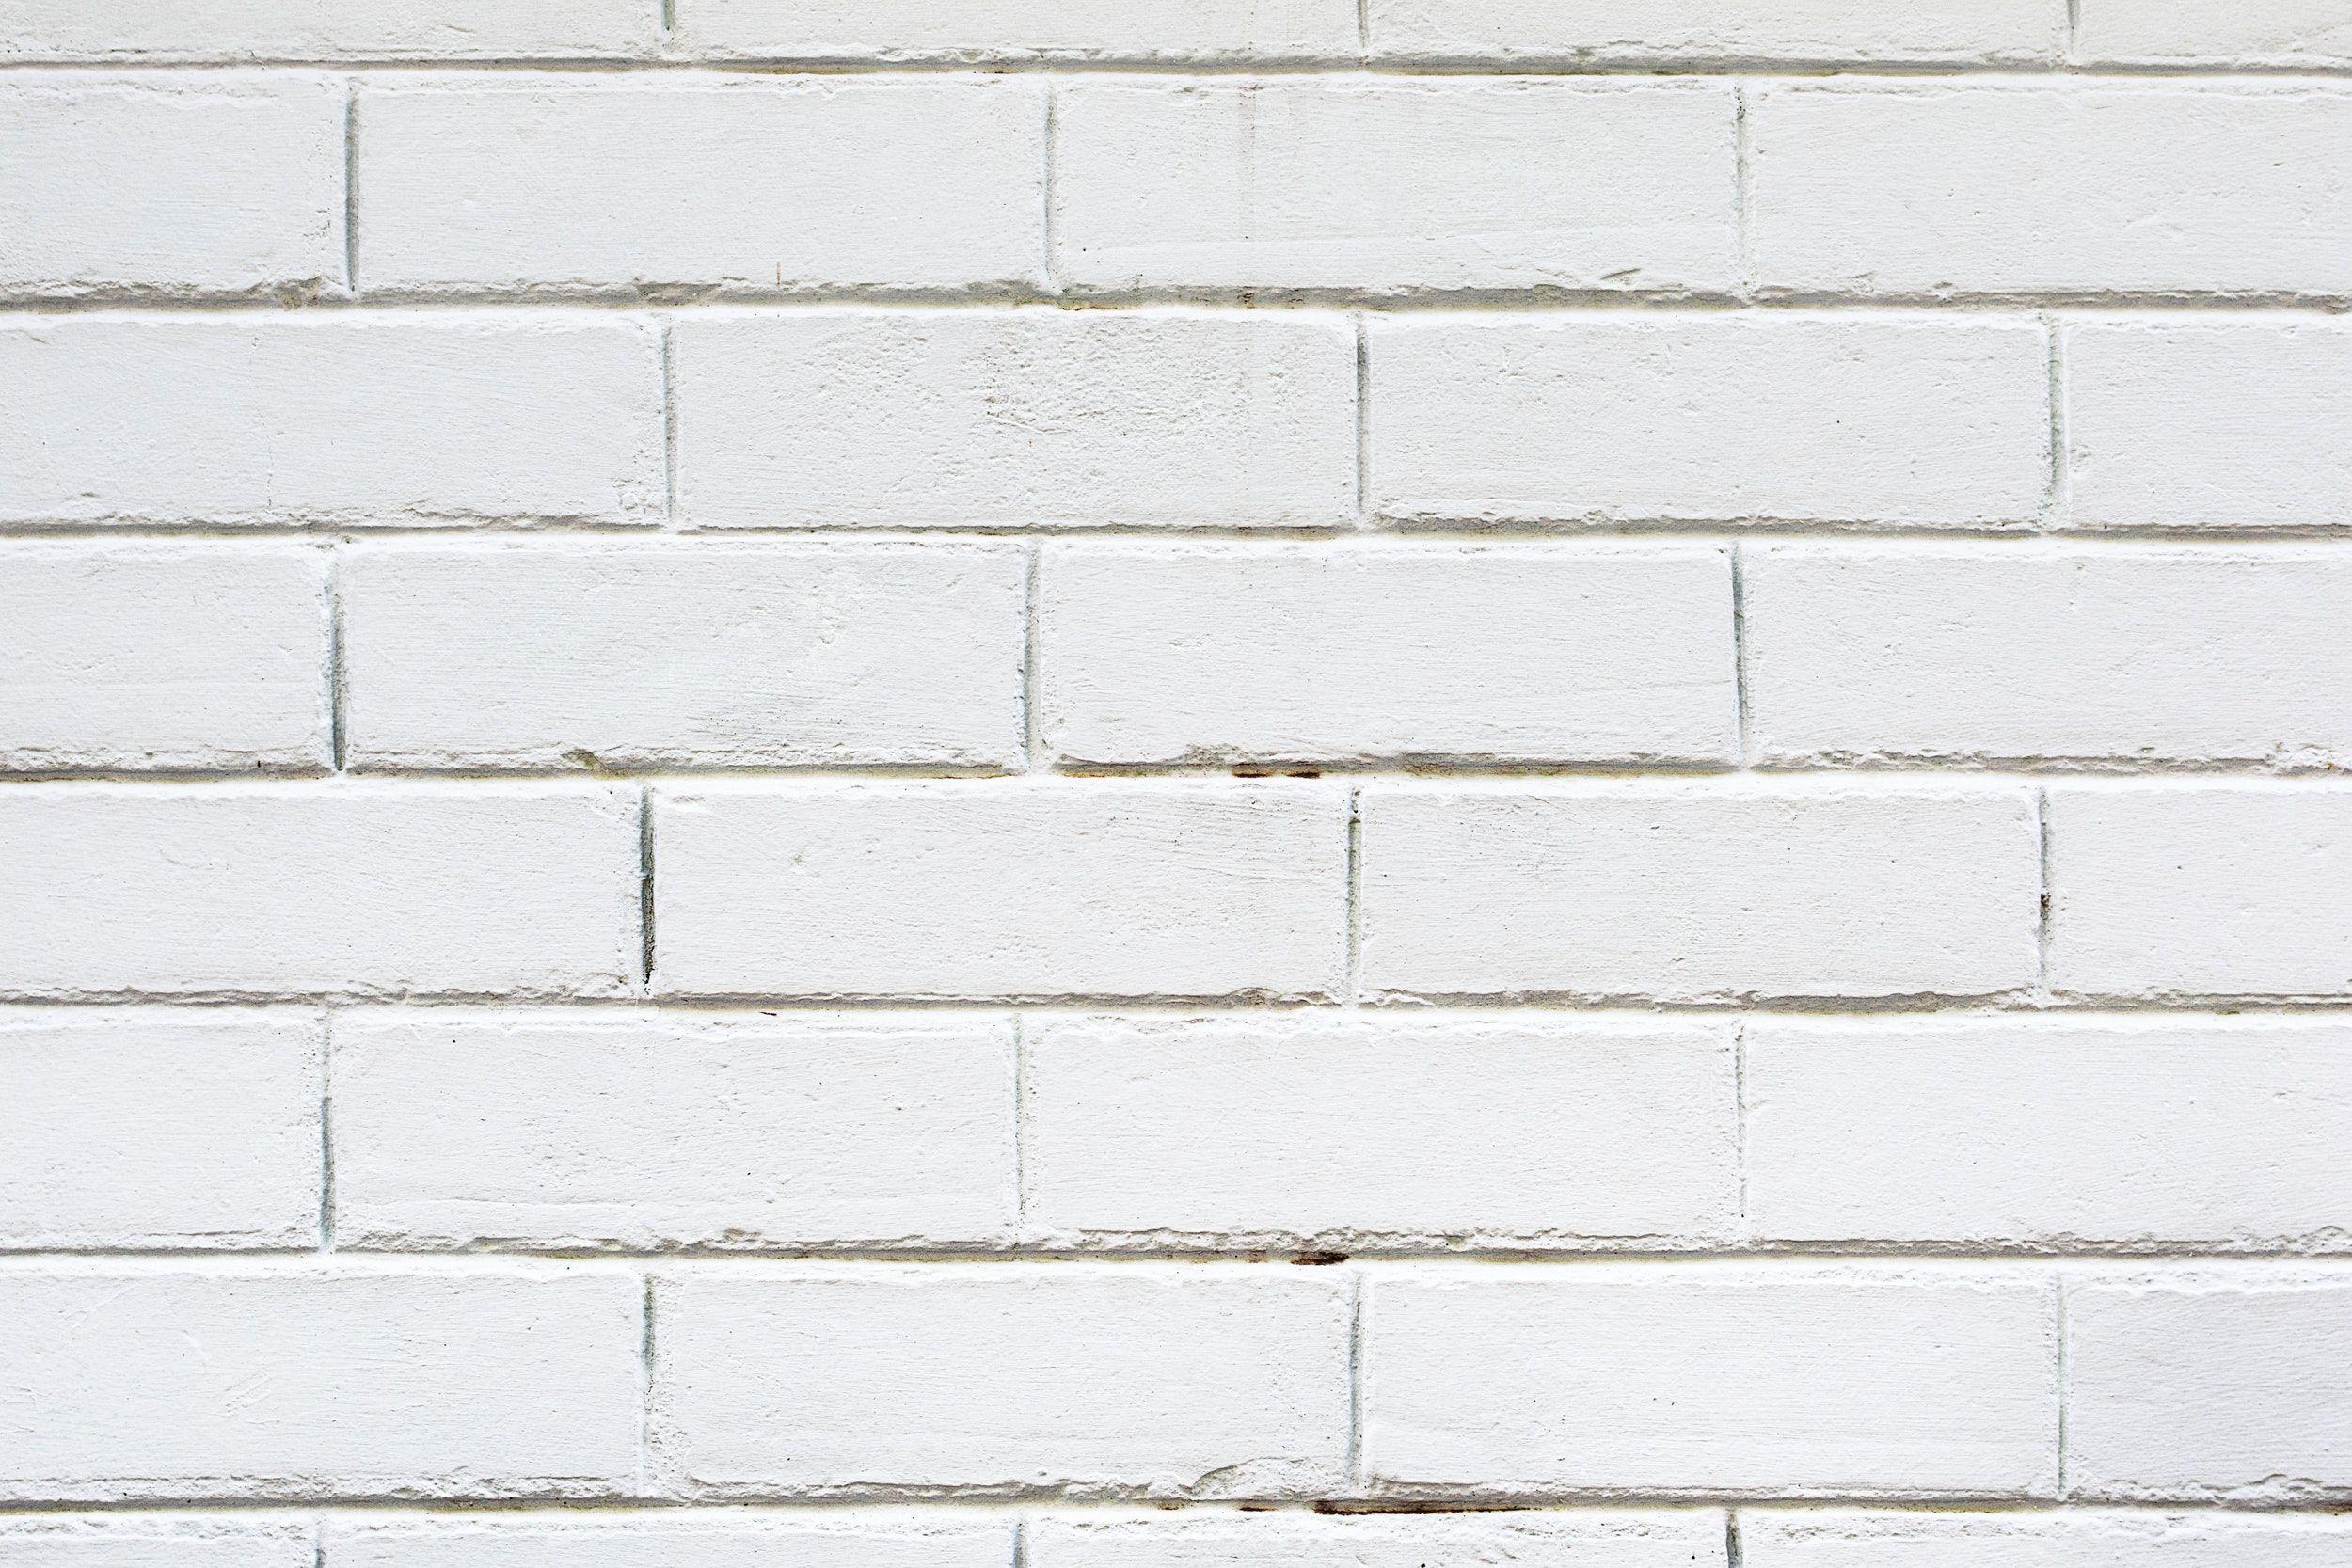 White Brick Desktop Wallpapers Top Free White Brick Desktop Backgrounds Wallpaperaccess